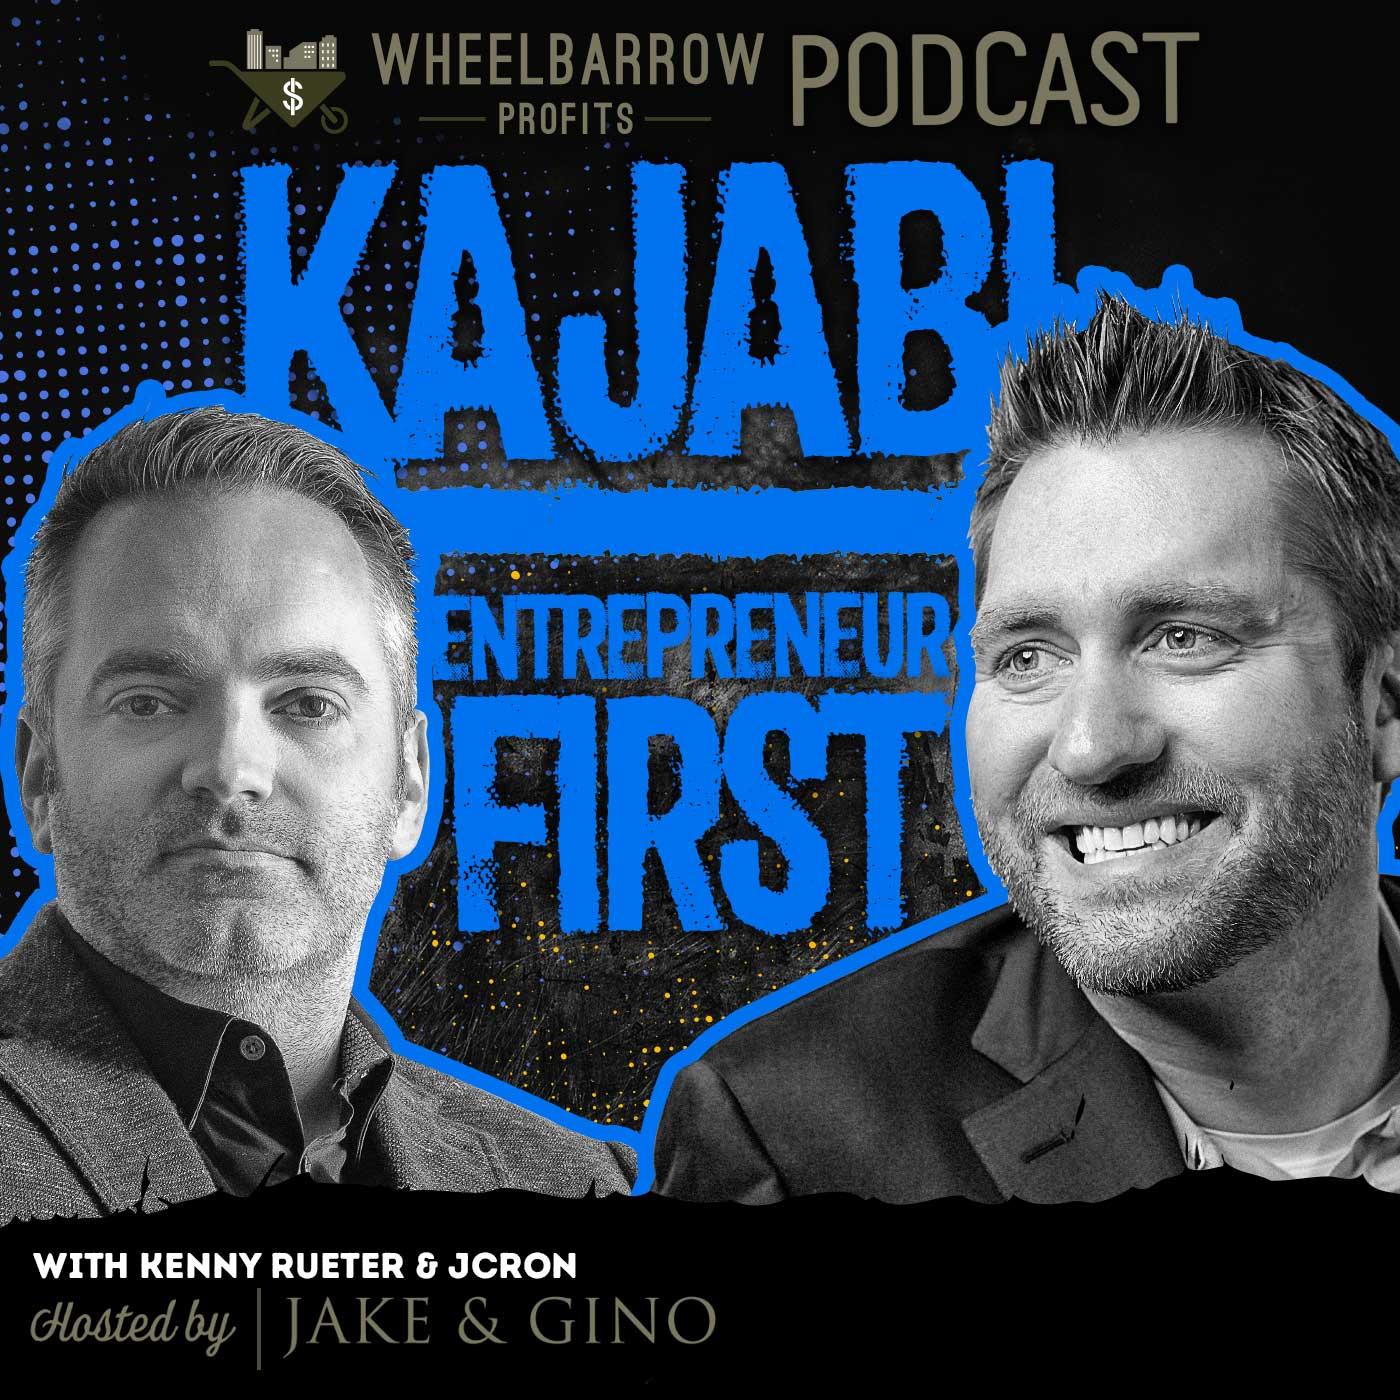 WBP - Kajabi is Entrepreneur First with Kenny Rueter & JCron